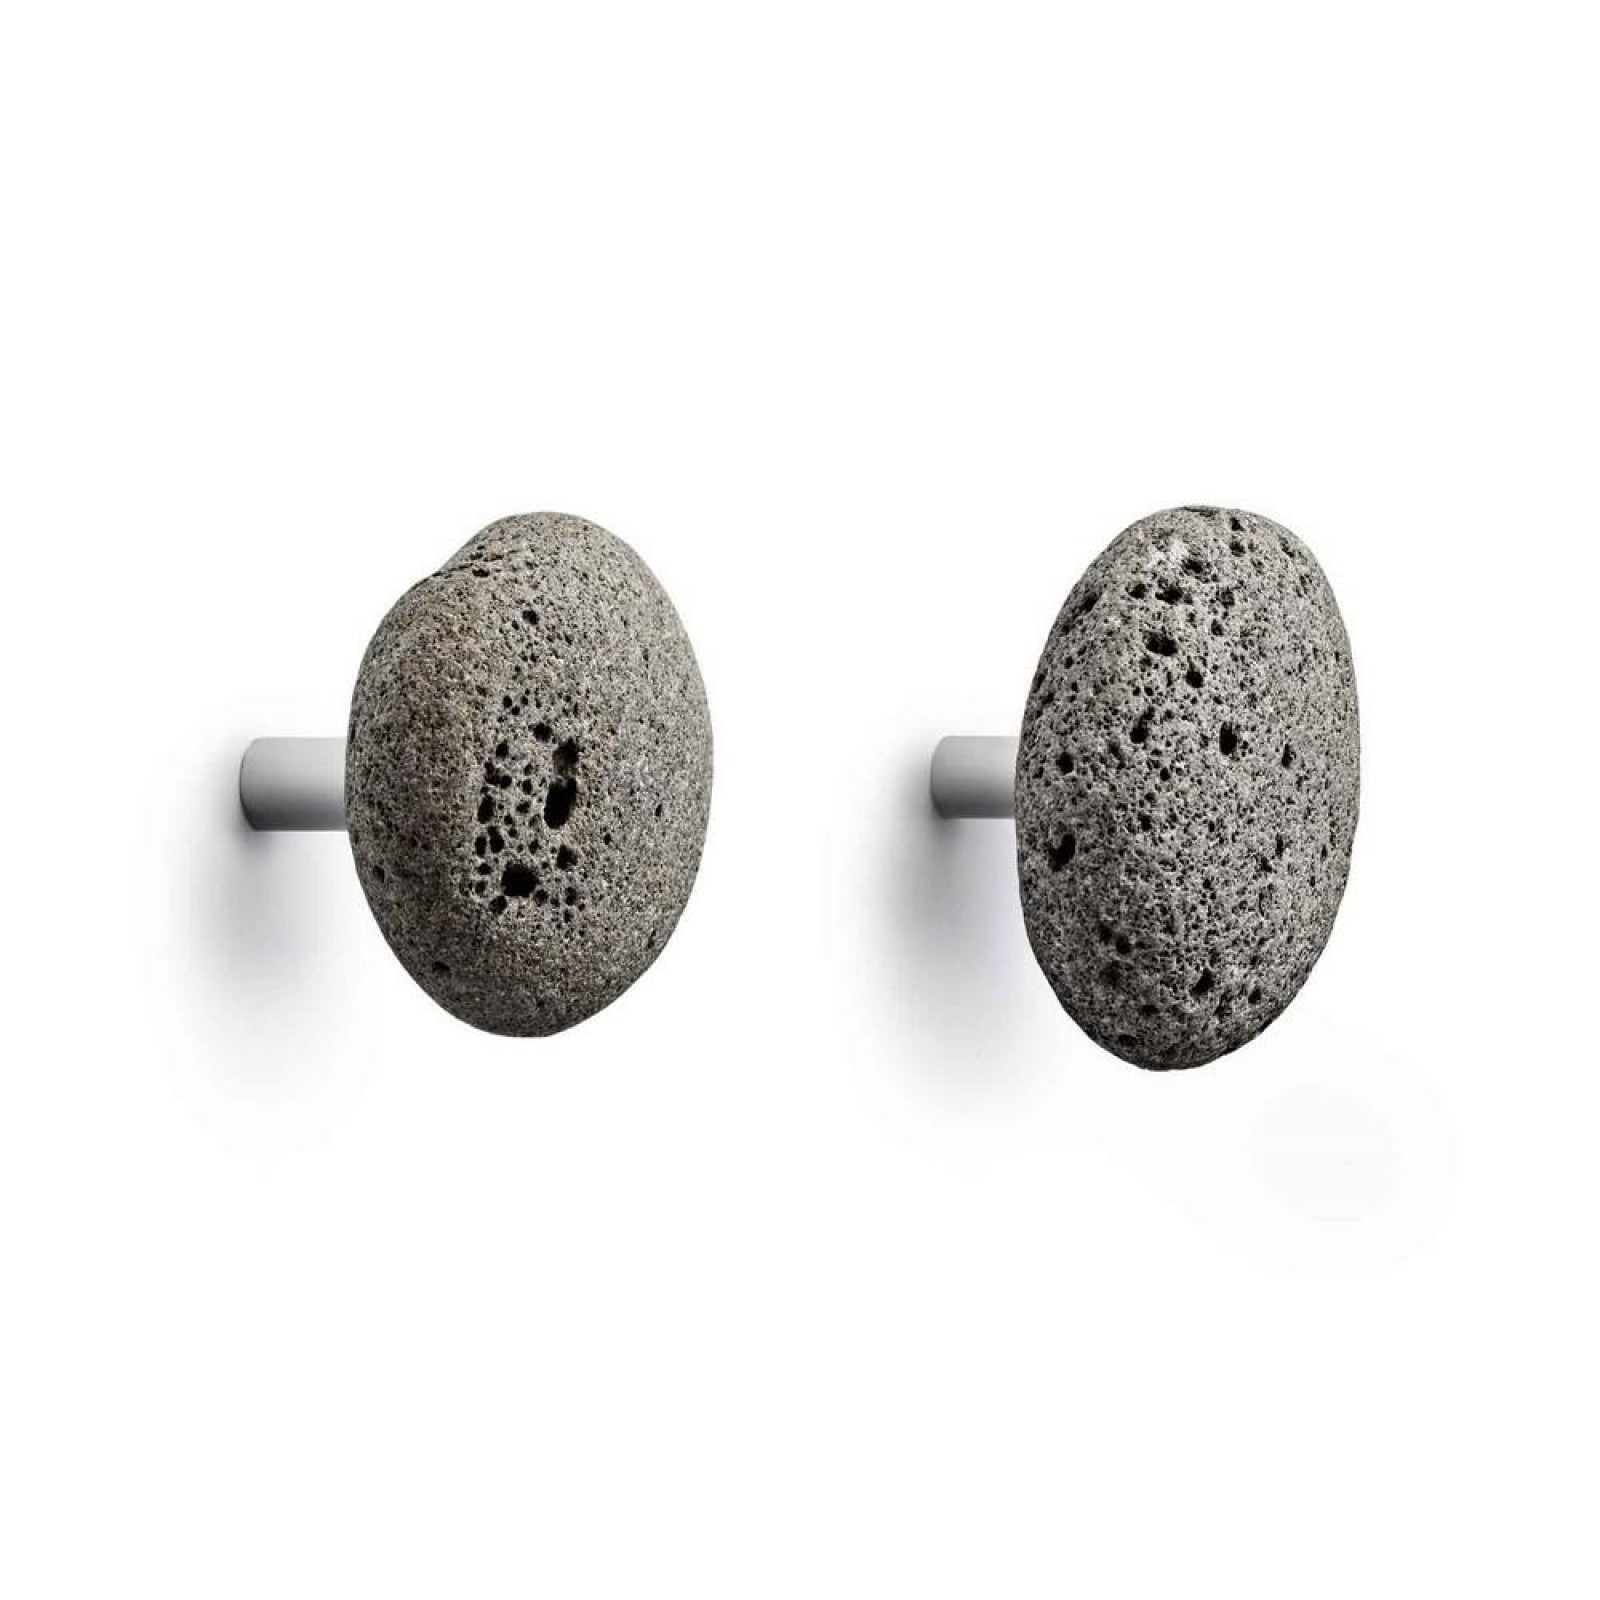 Stone Hooks (set of 2) - Normann Copenhagen